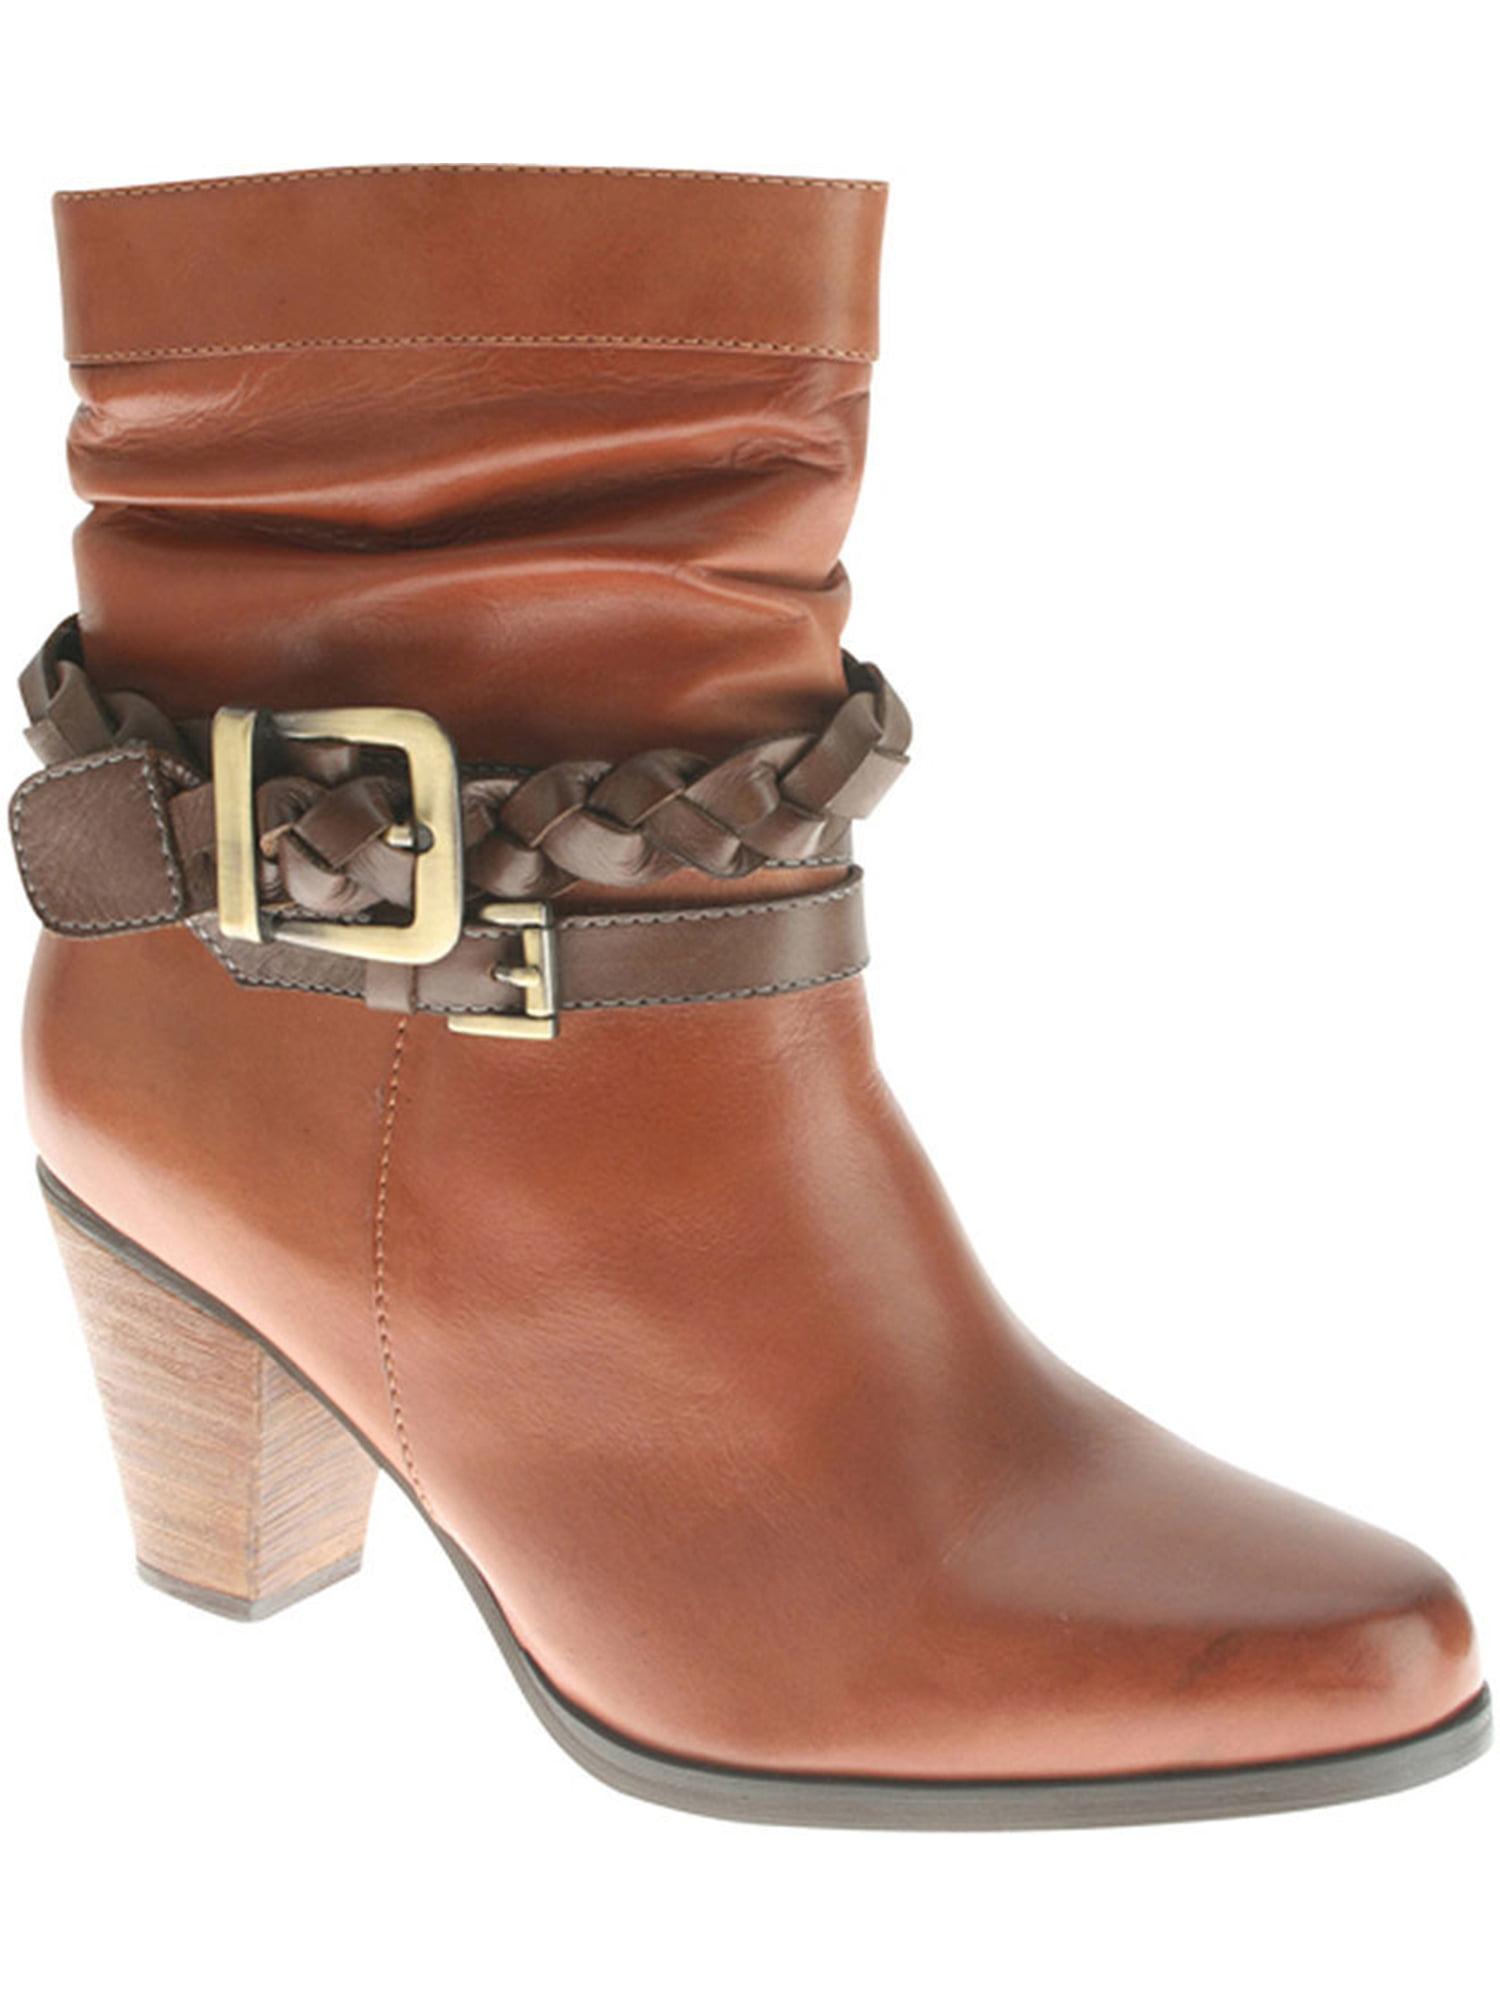 Spring Step 40 Women's Medina Brown Boots 40 Step M EU 9 M 31a6ca